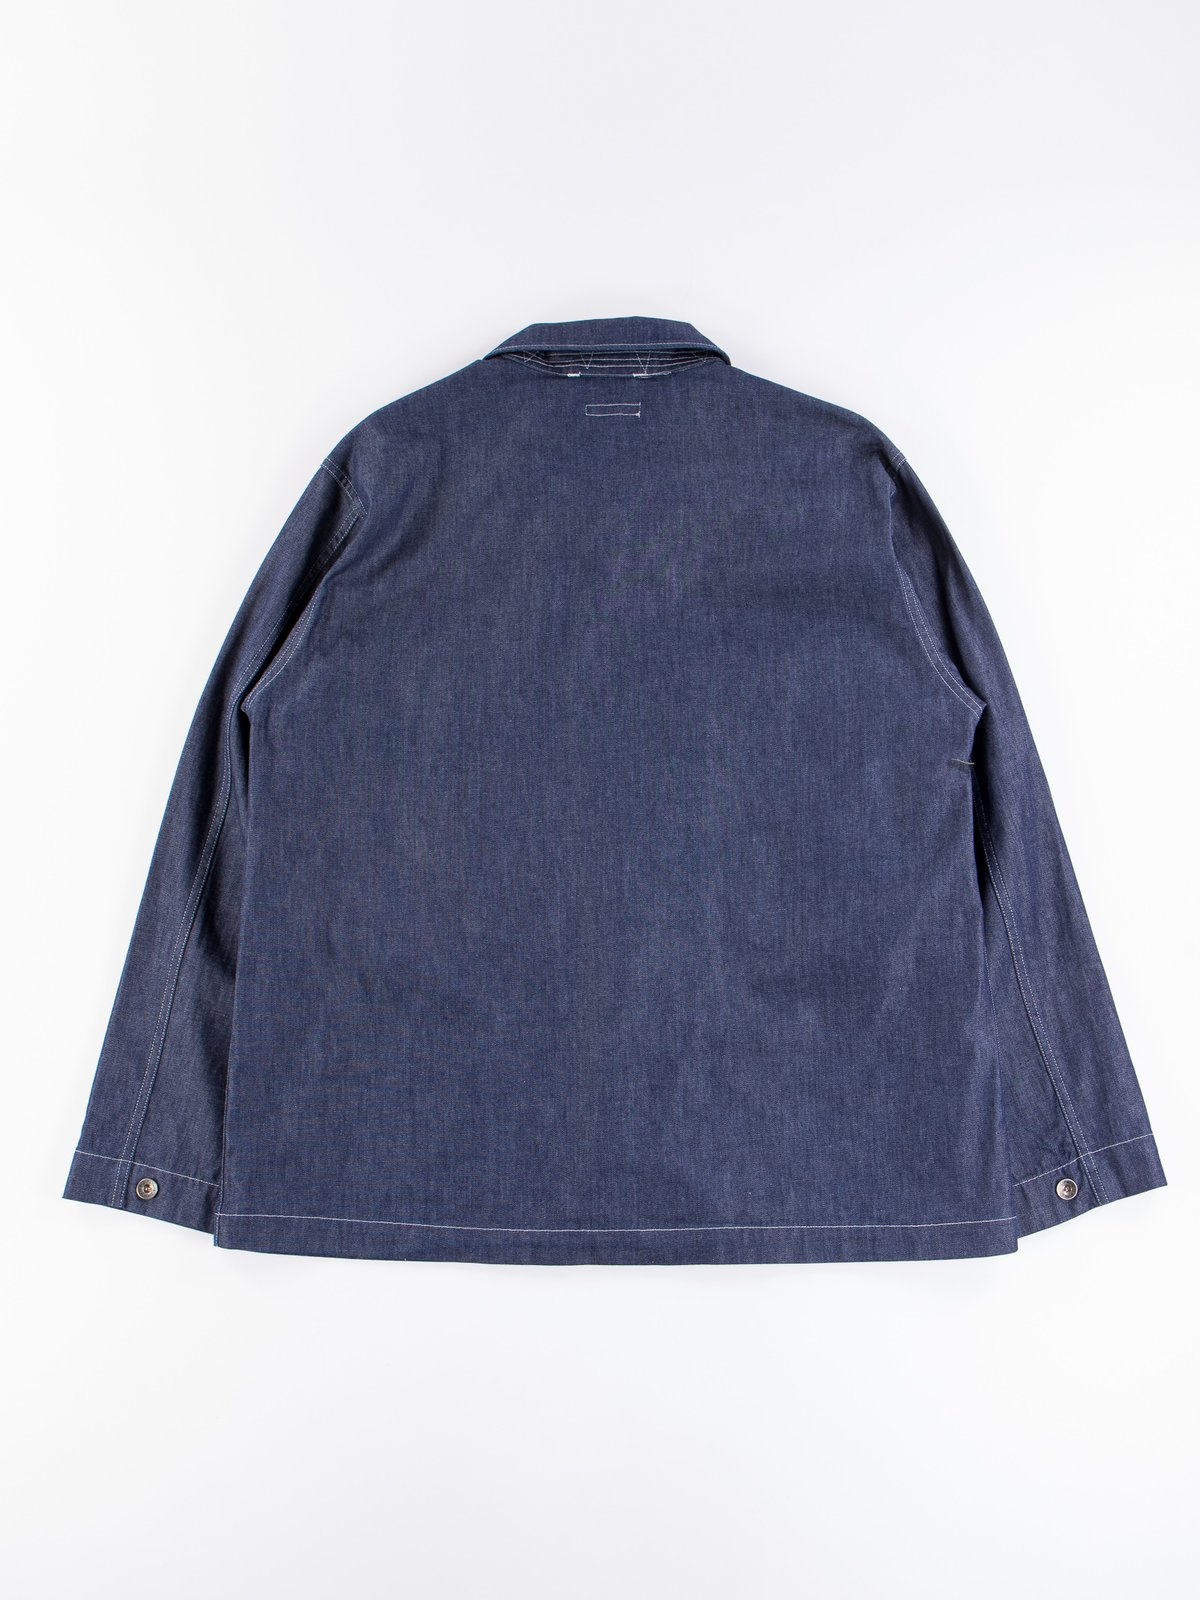 Indigo 8oz Cone Denim M43/2 Shirt Jacket - Image 9